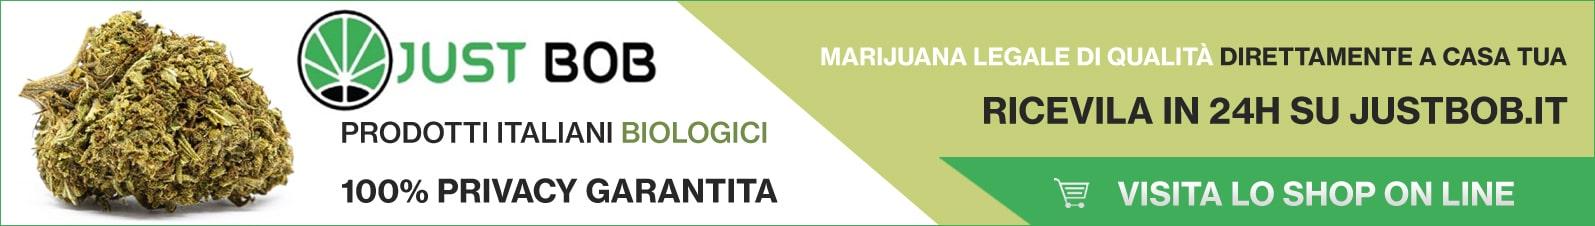 Banner Justbob marijuana legale di qualità direttamente a casa tua